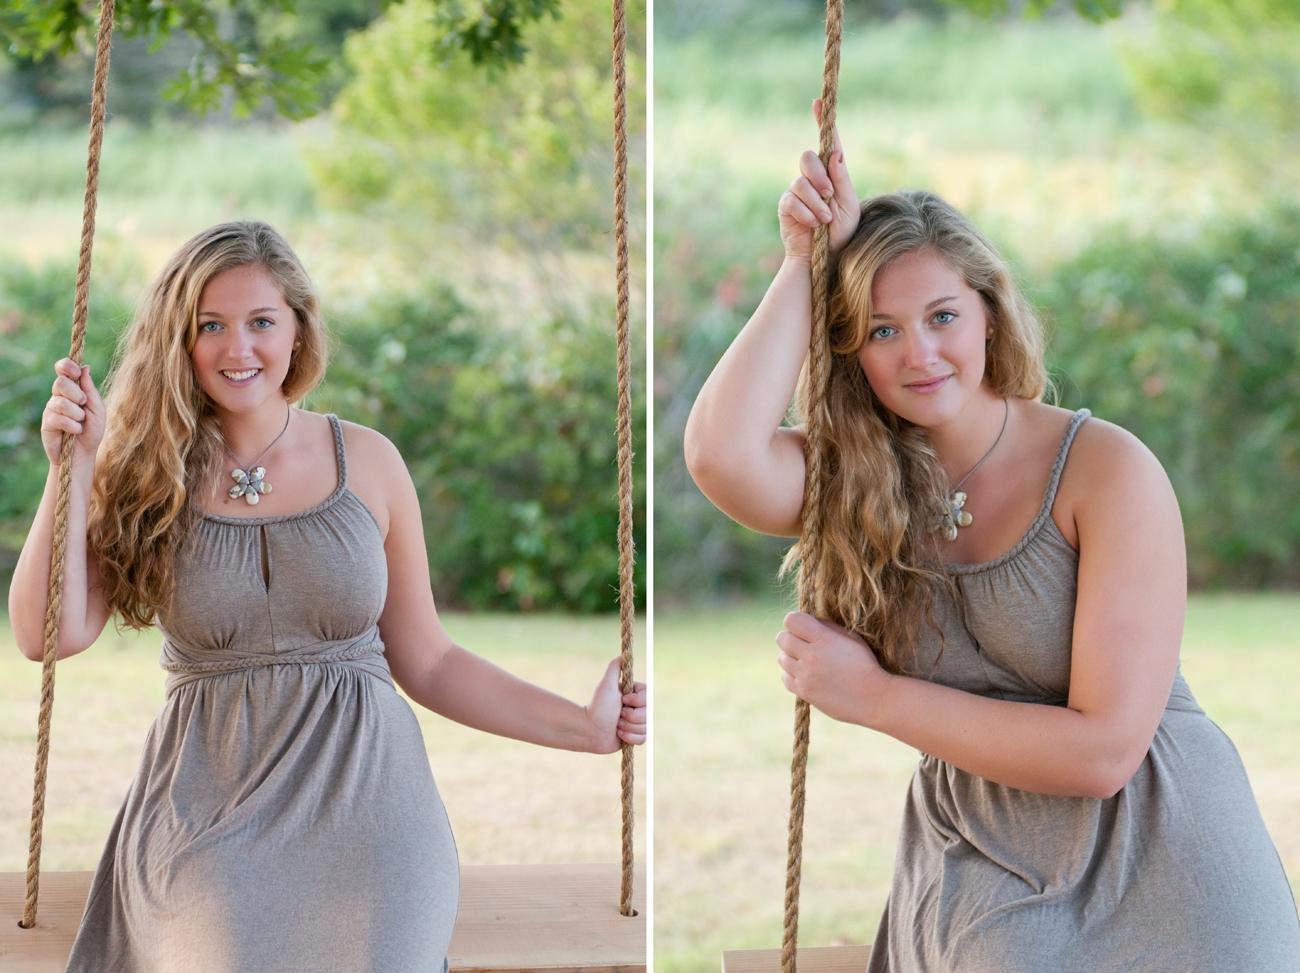 Angela-Chicoski-Photography-Connecticut-Wedding-High-School-Senior-Boudoir-Photographer_007.jpg